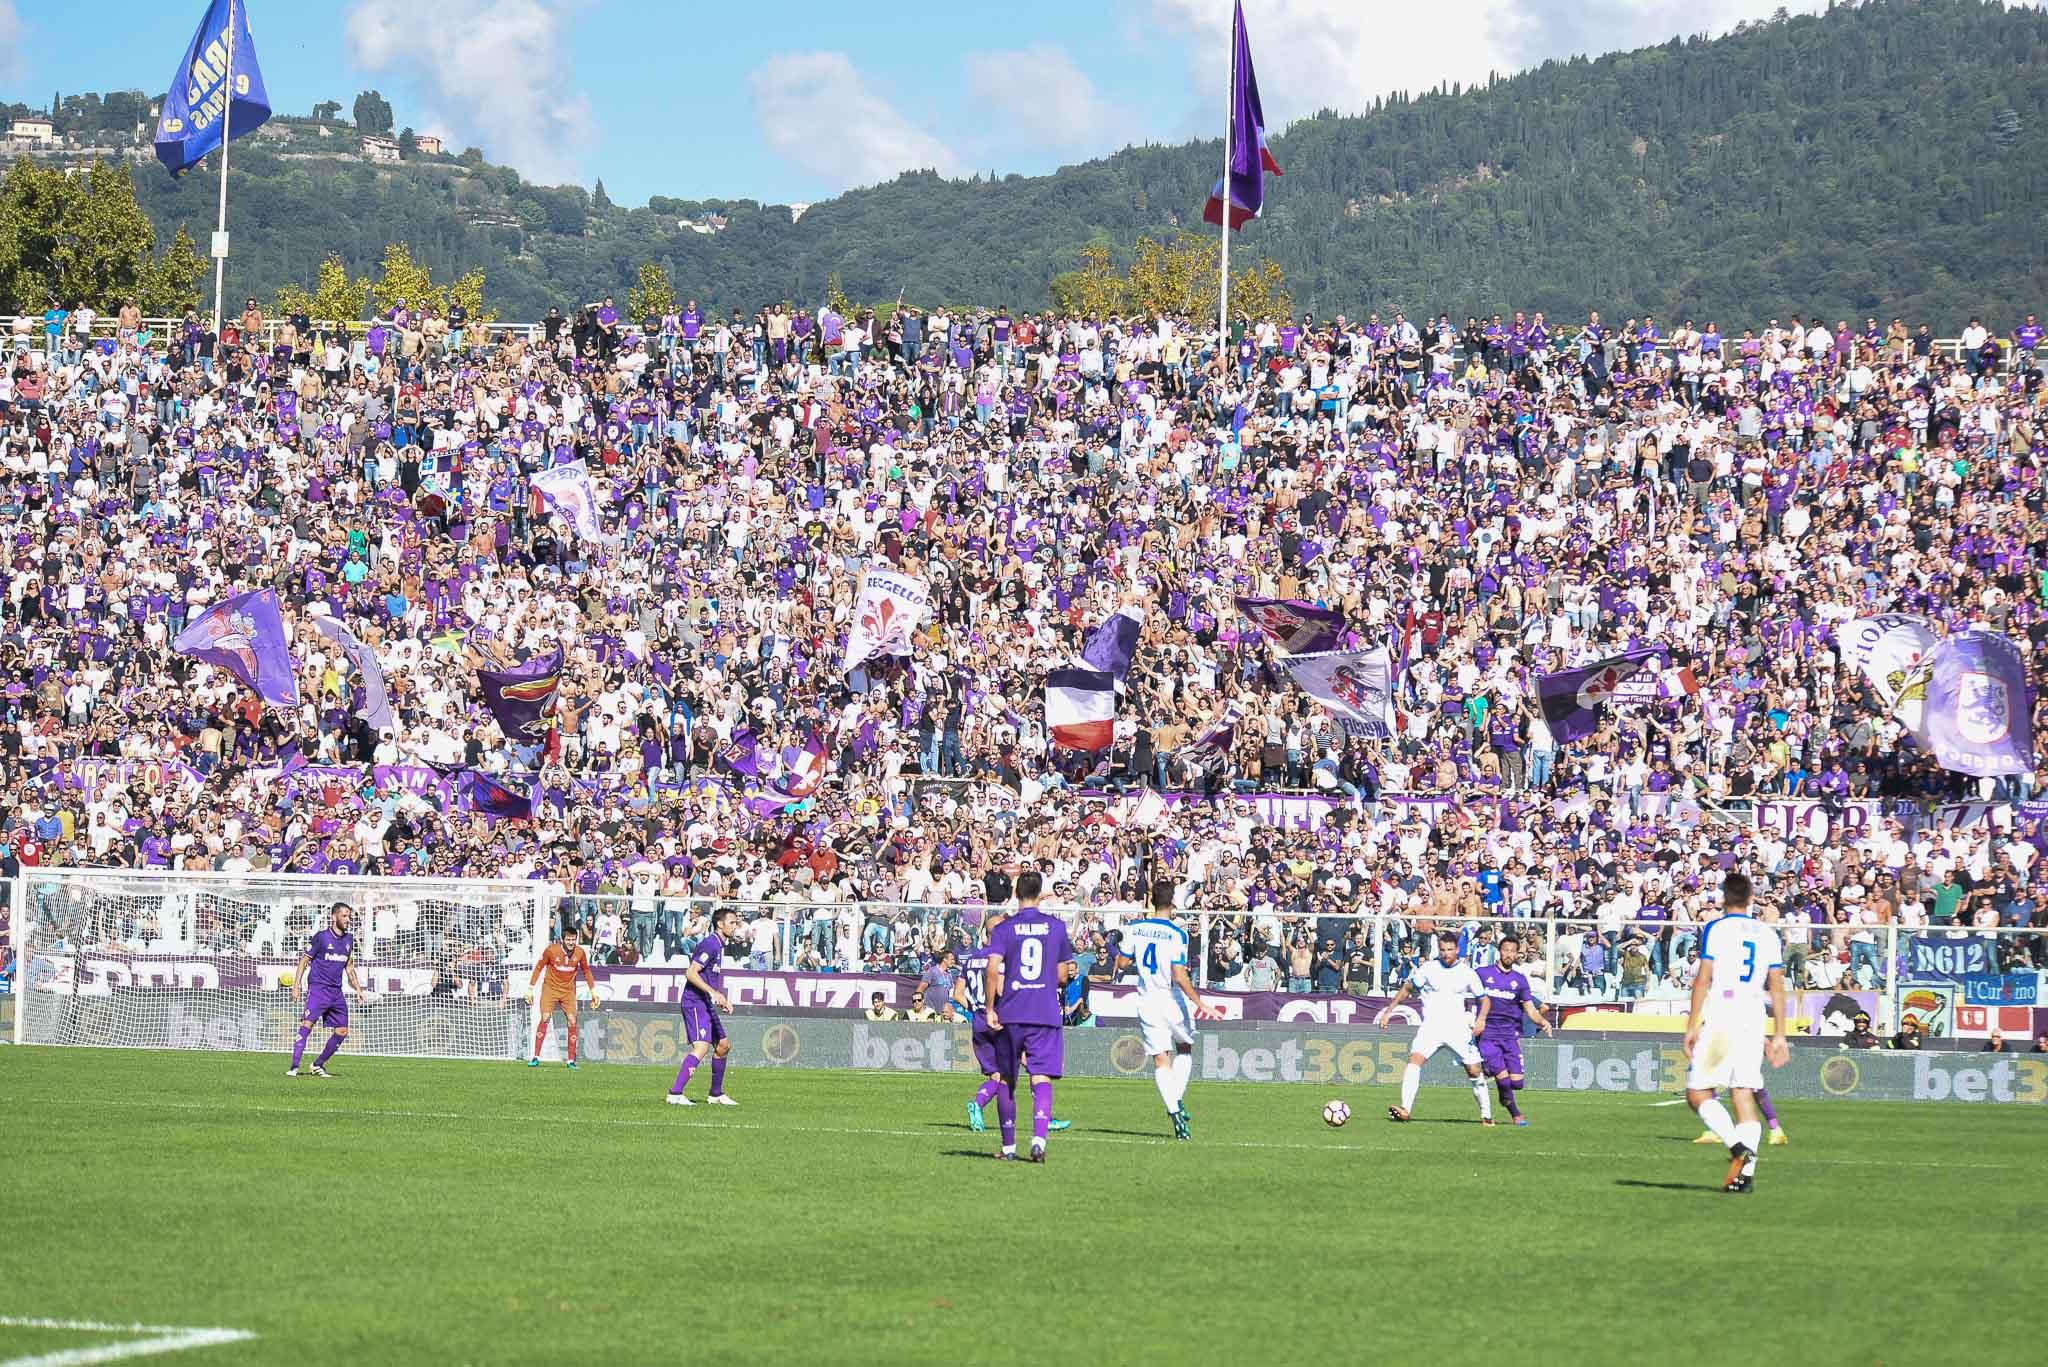 Fiorentina-Atalanta, gli ultimi 10 precedenti in serie A tra i due club. Nessuna vittoria dei nerazzurri